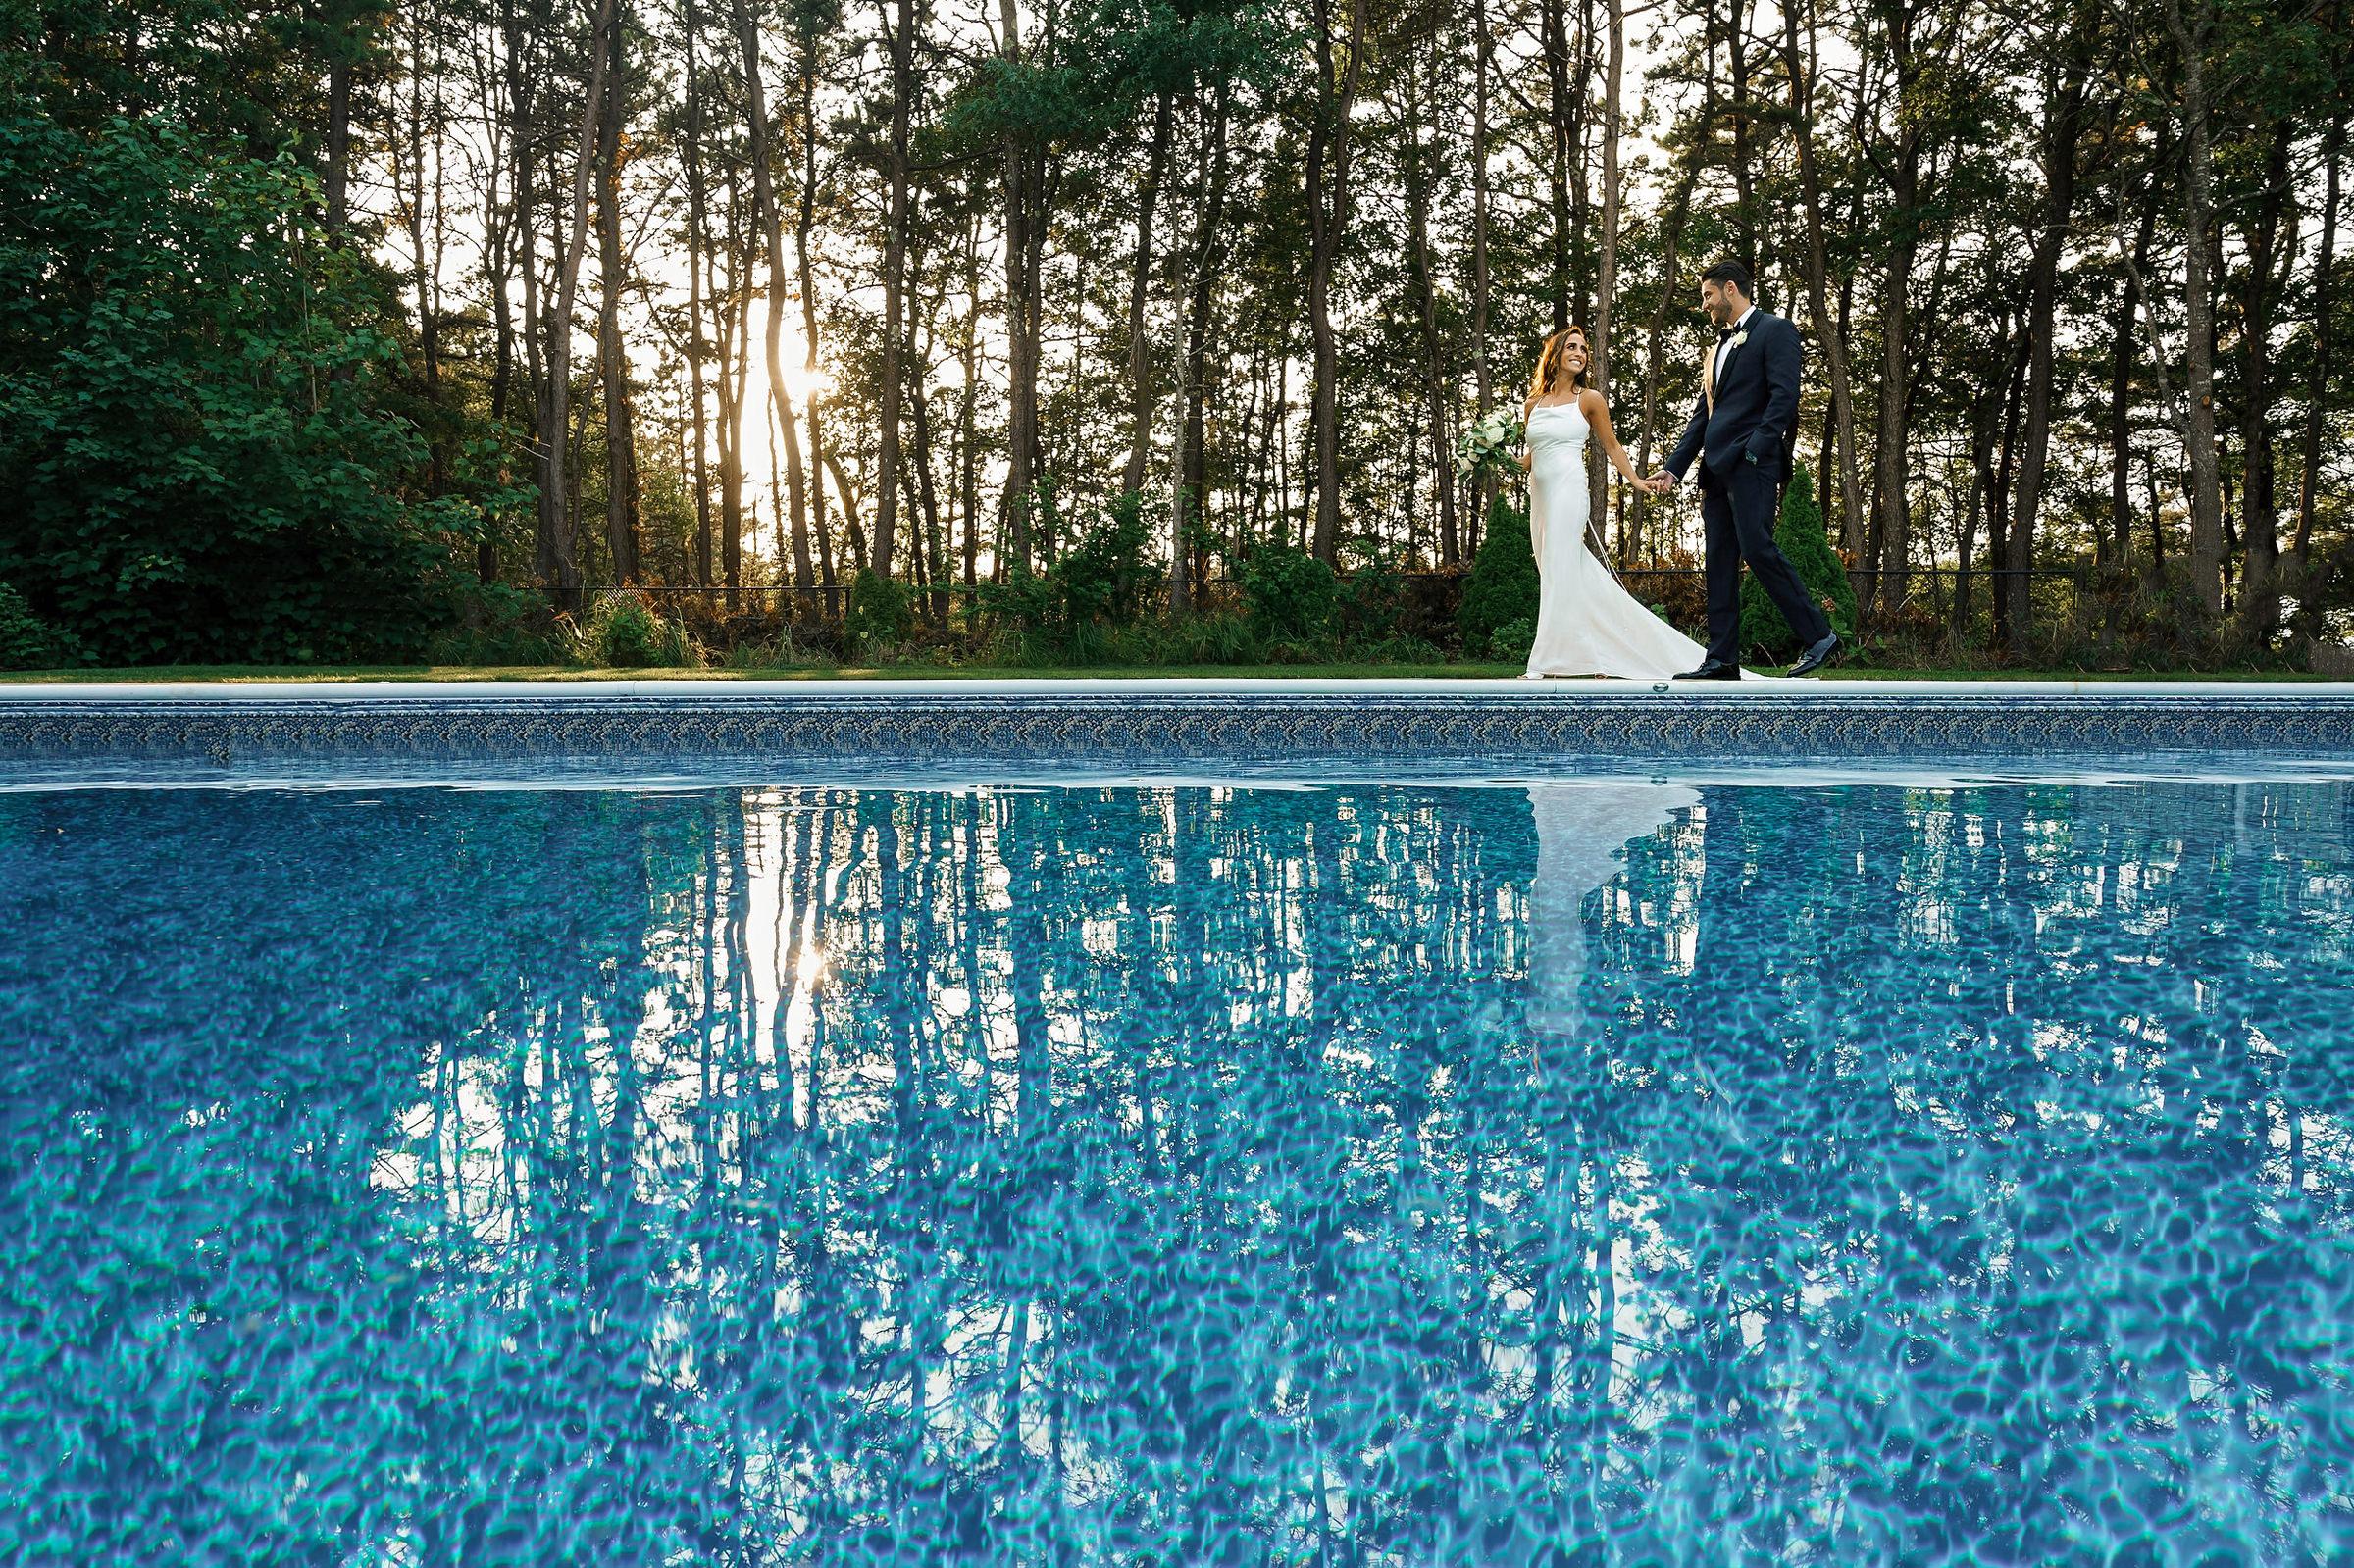 Couple walking by pool by Alex Gordias - Cape Cod